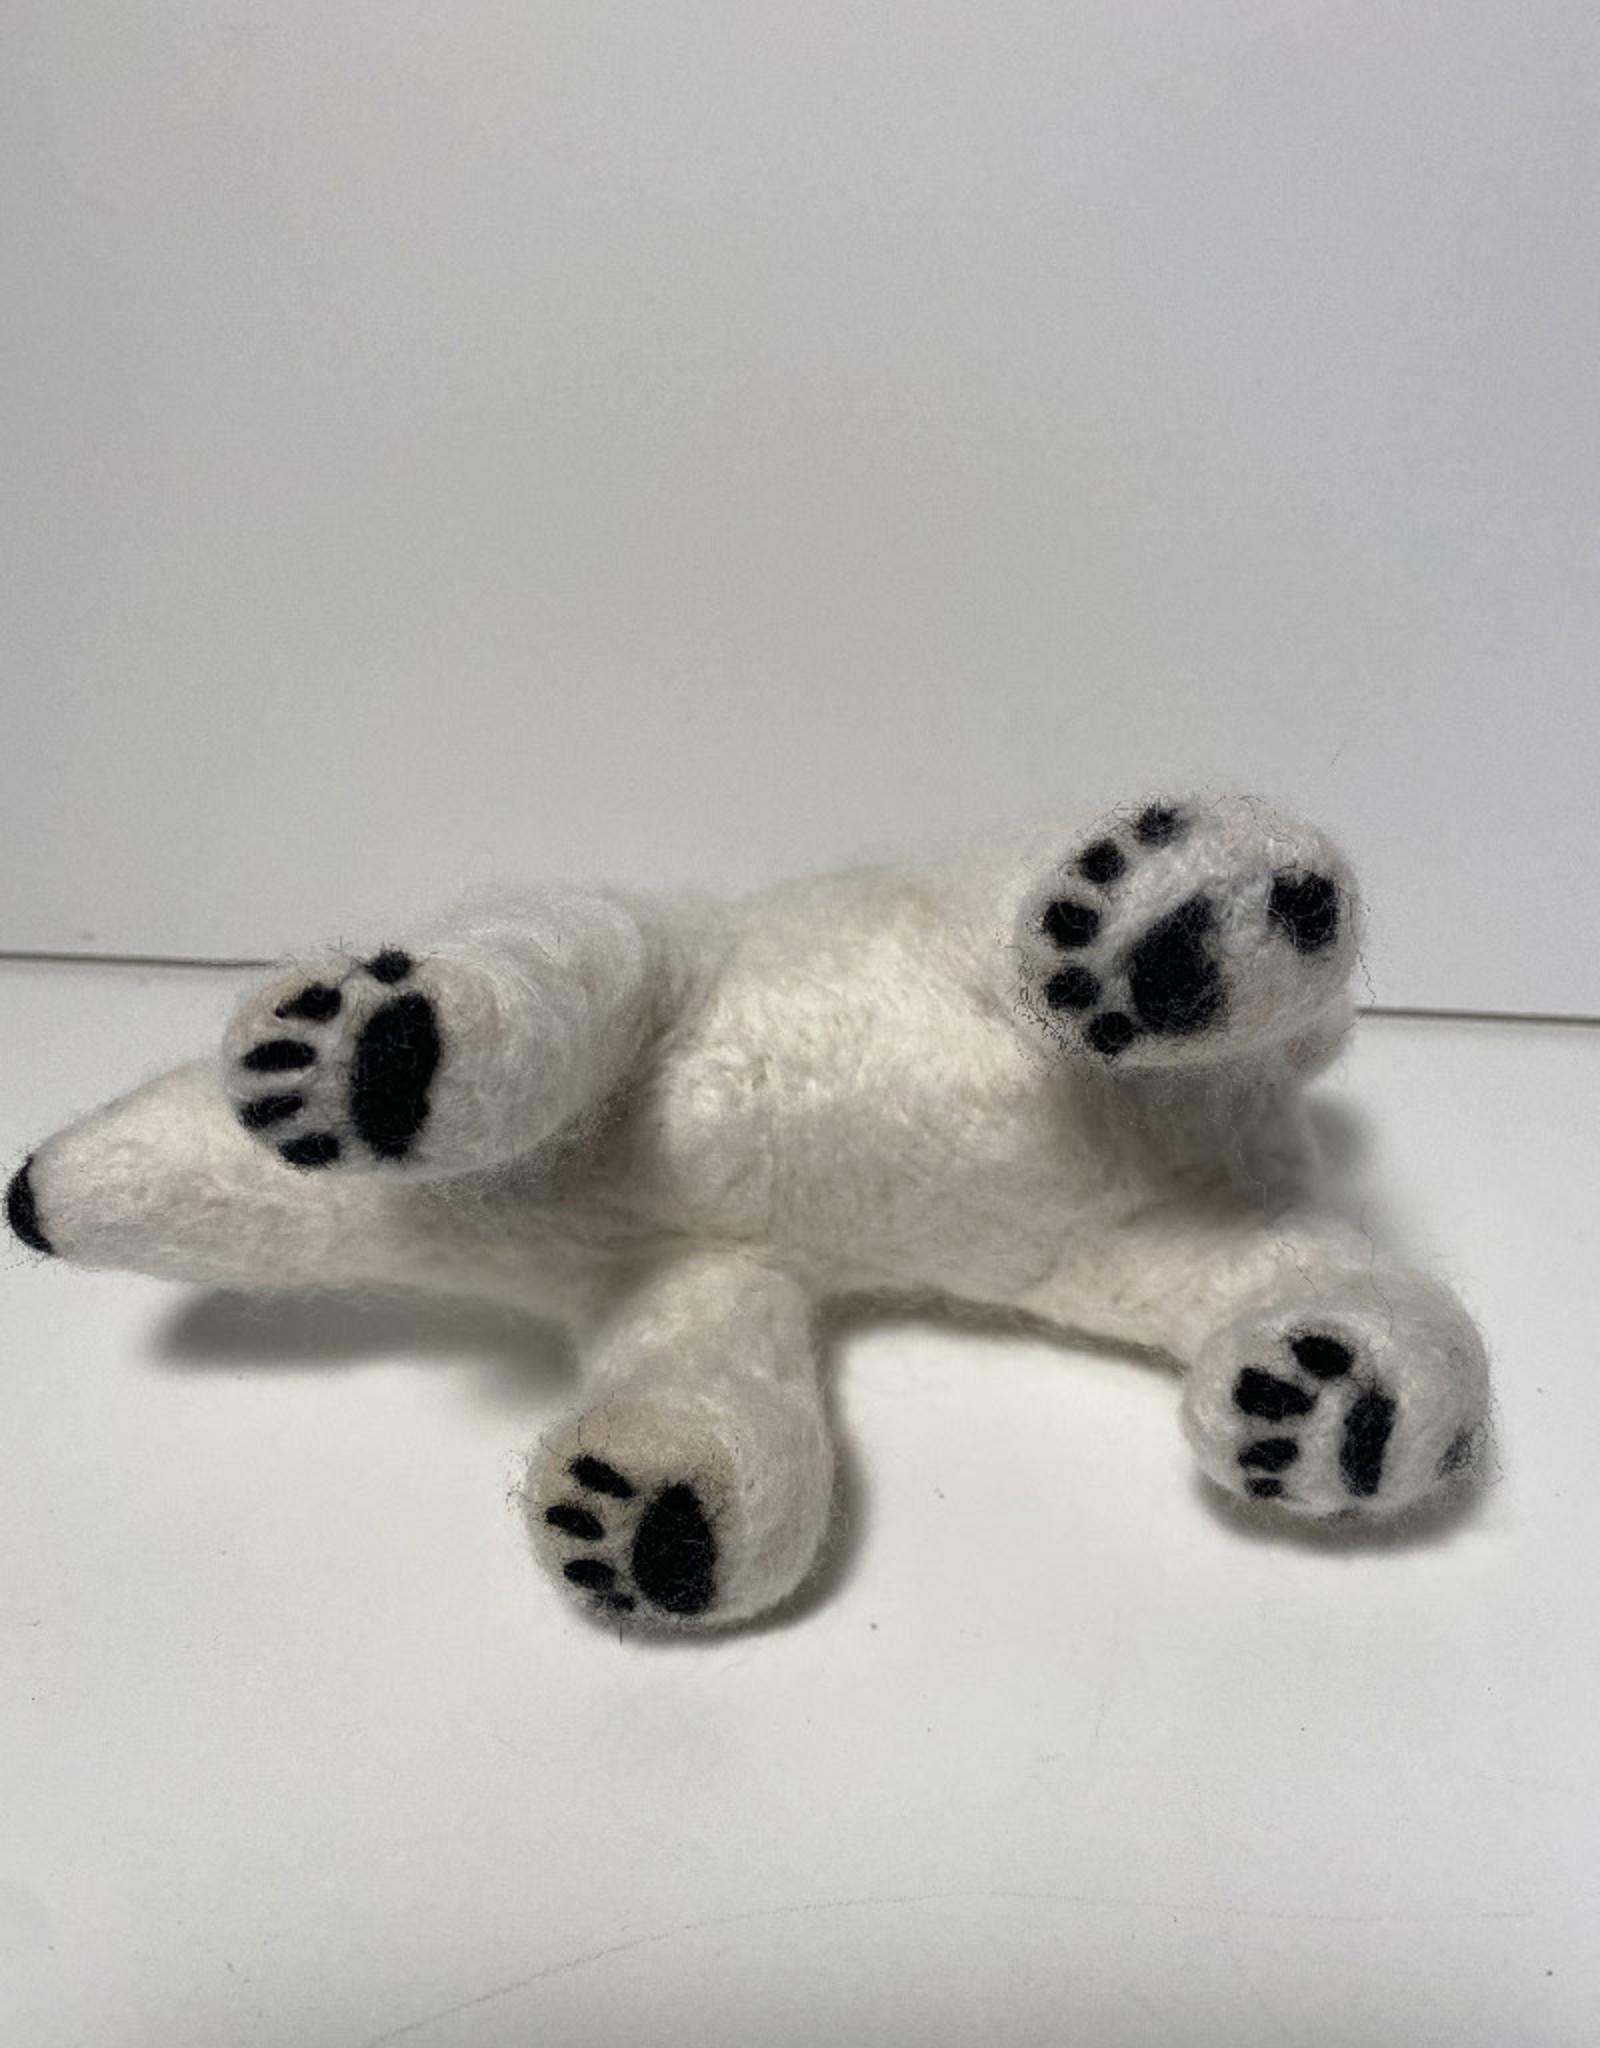 Jennifer Cook-Chrysos Chrysos Designs Artworks, Felted Polar Bear, 6 x 3.5 x 3 inches.